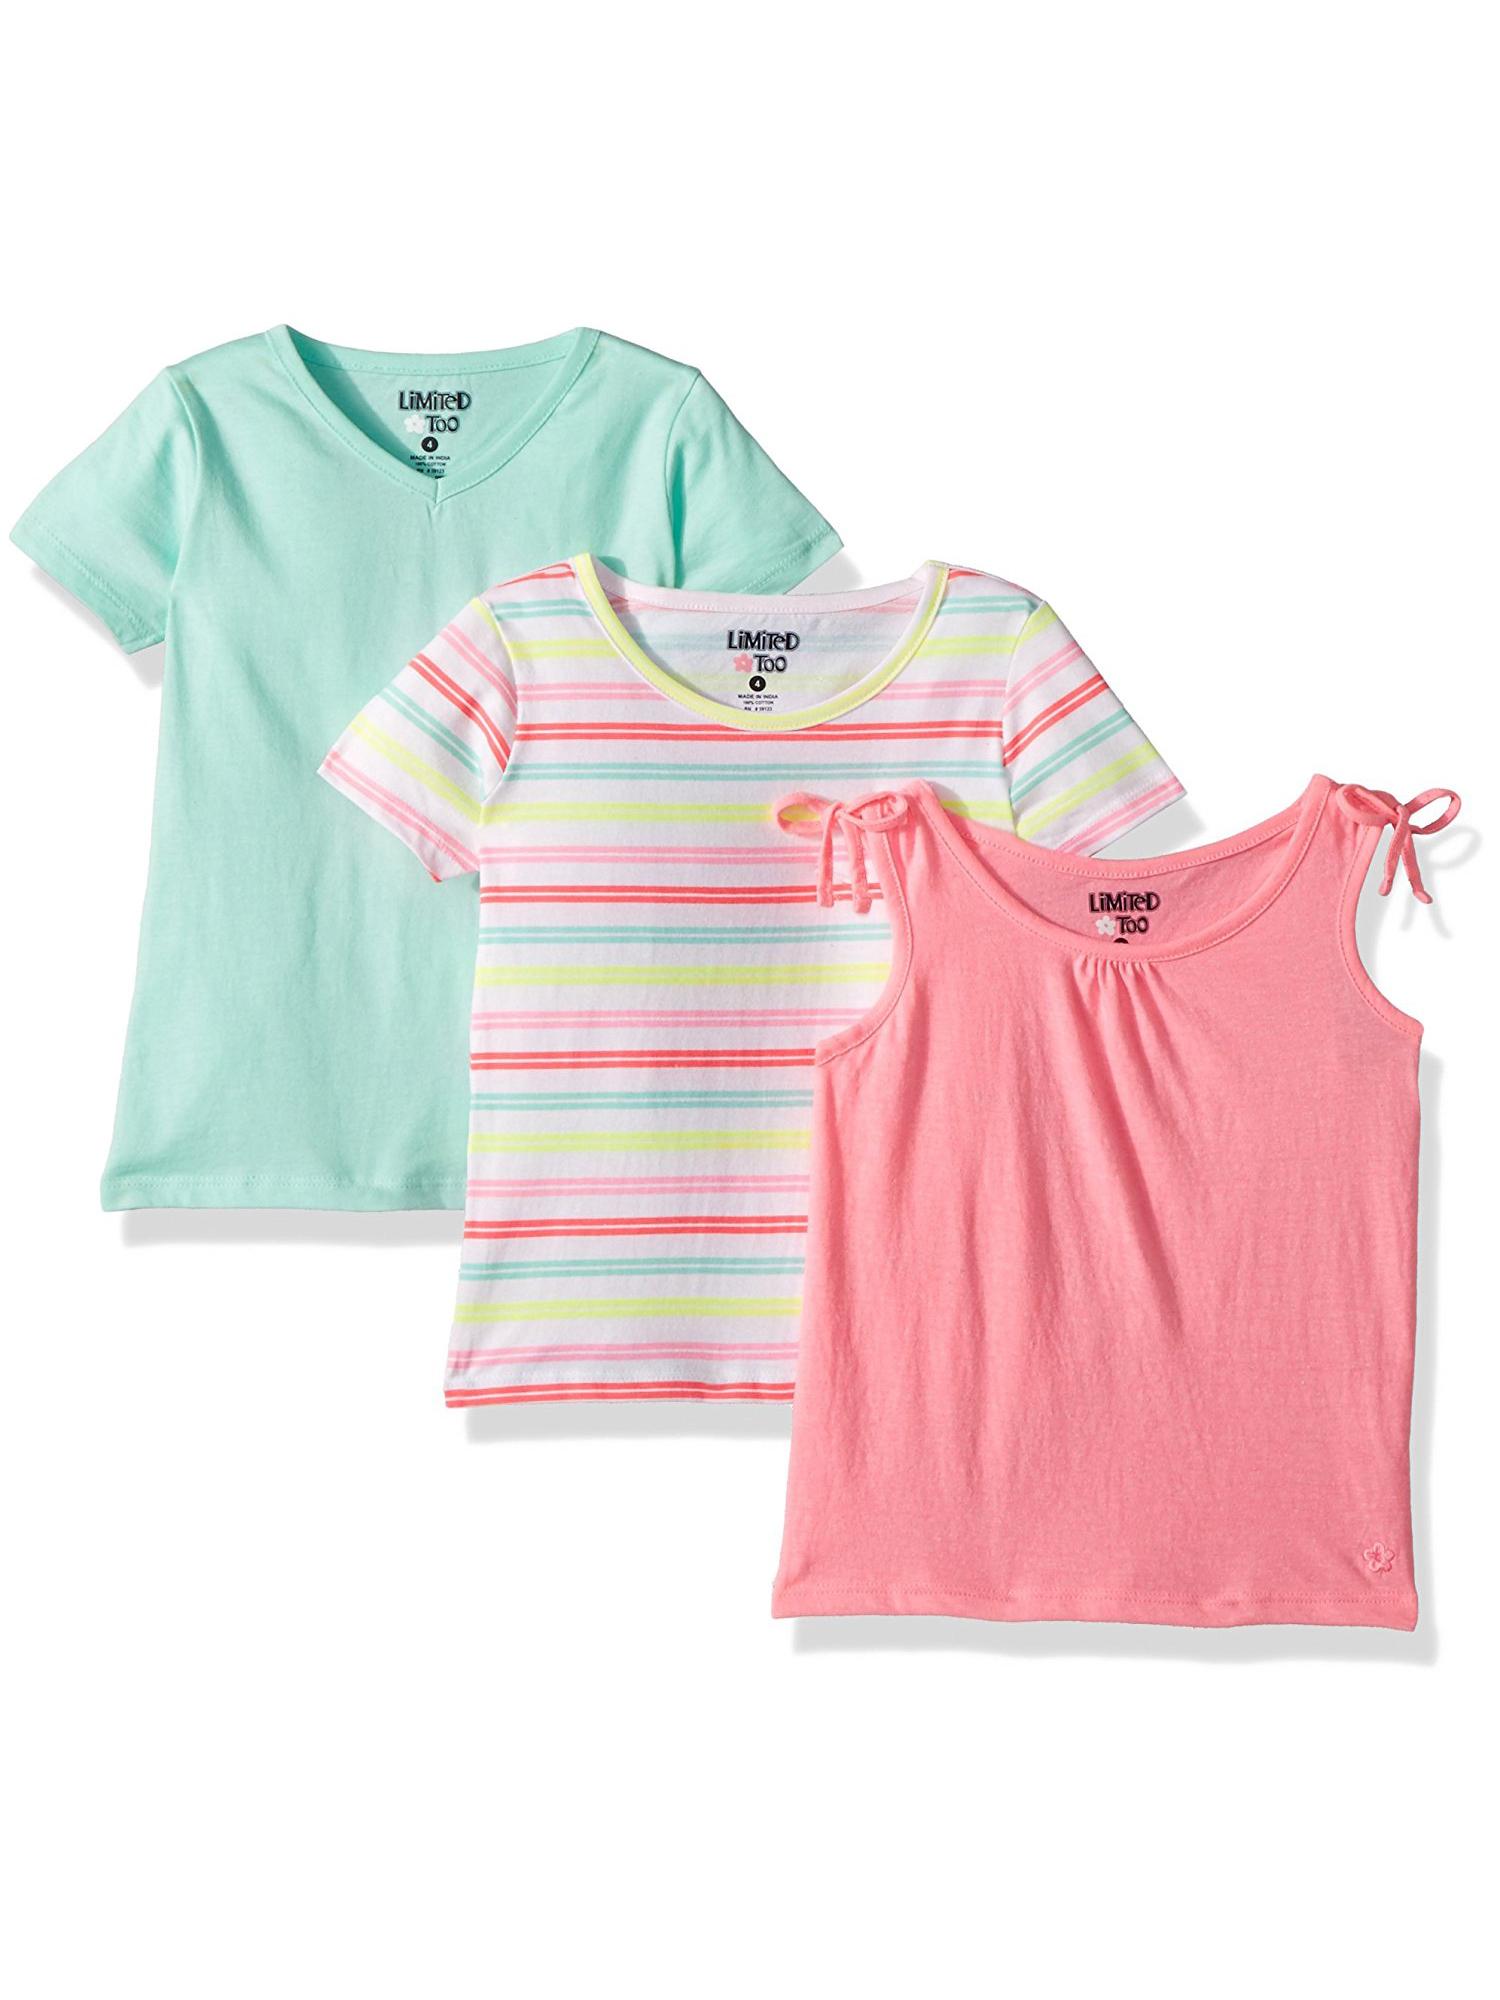 Toddler Girl Tank Top & T-shirts, 3-pack